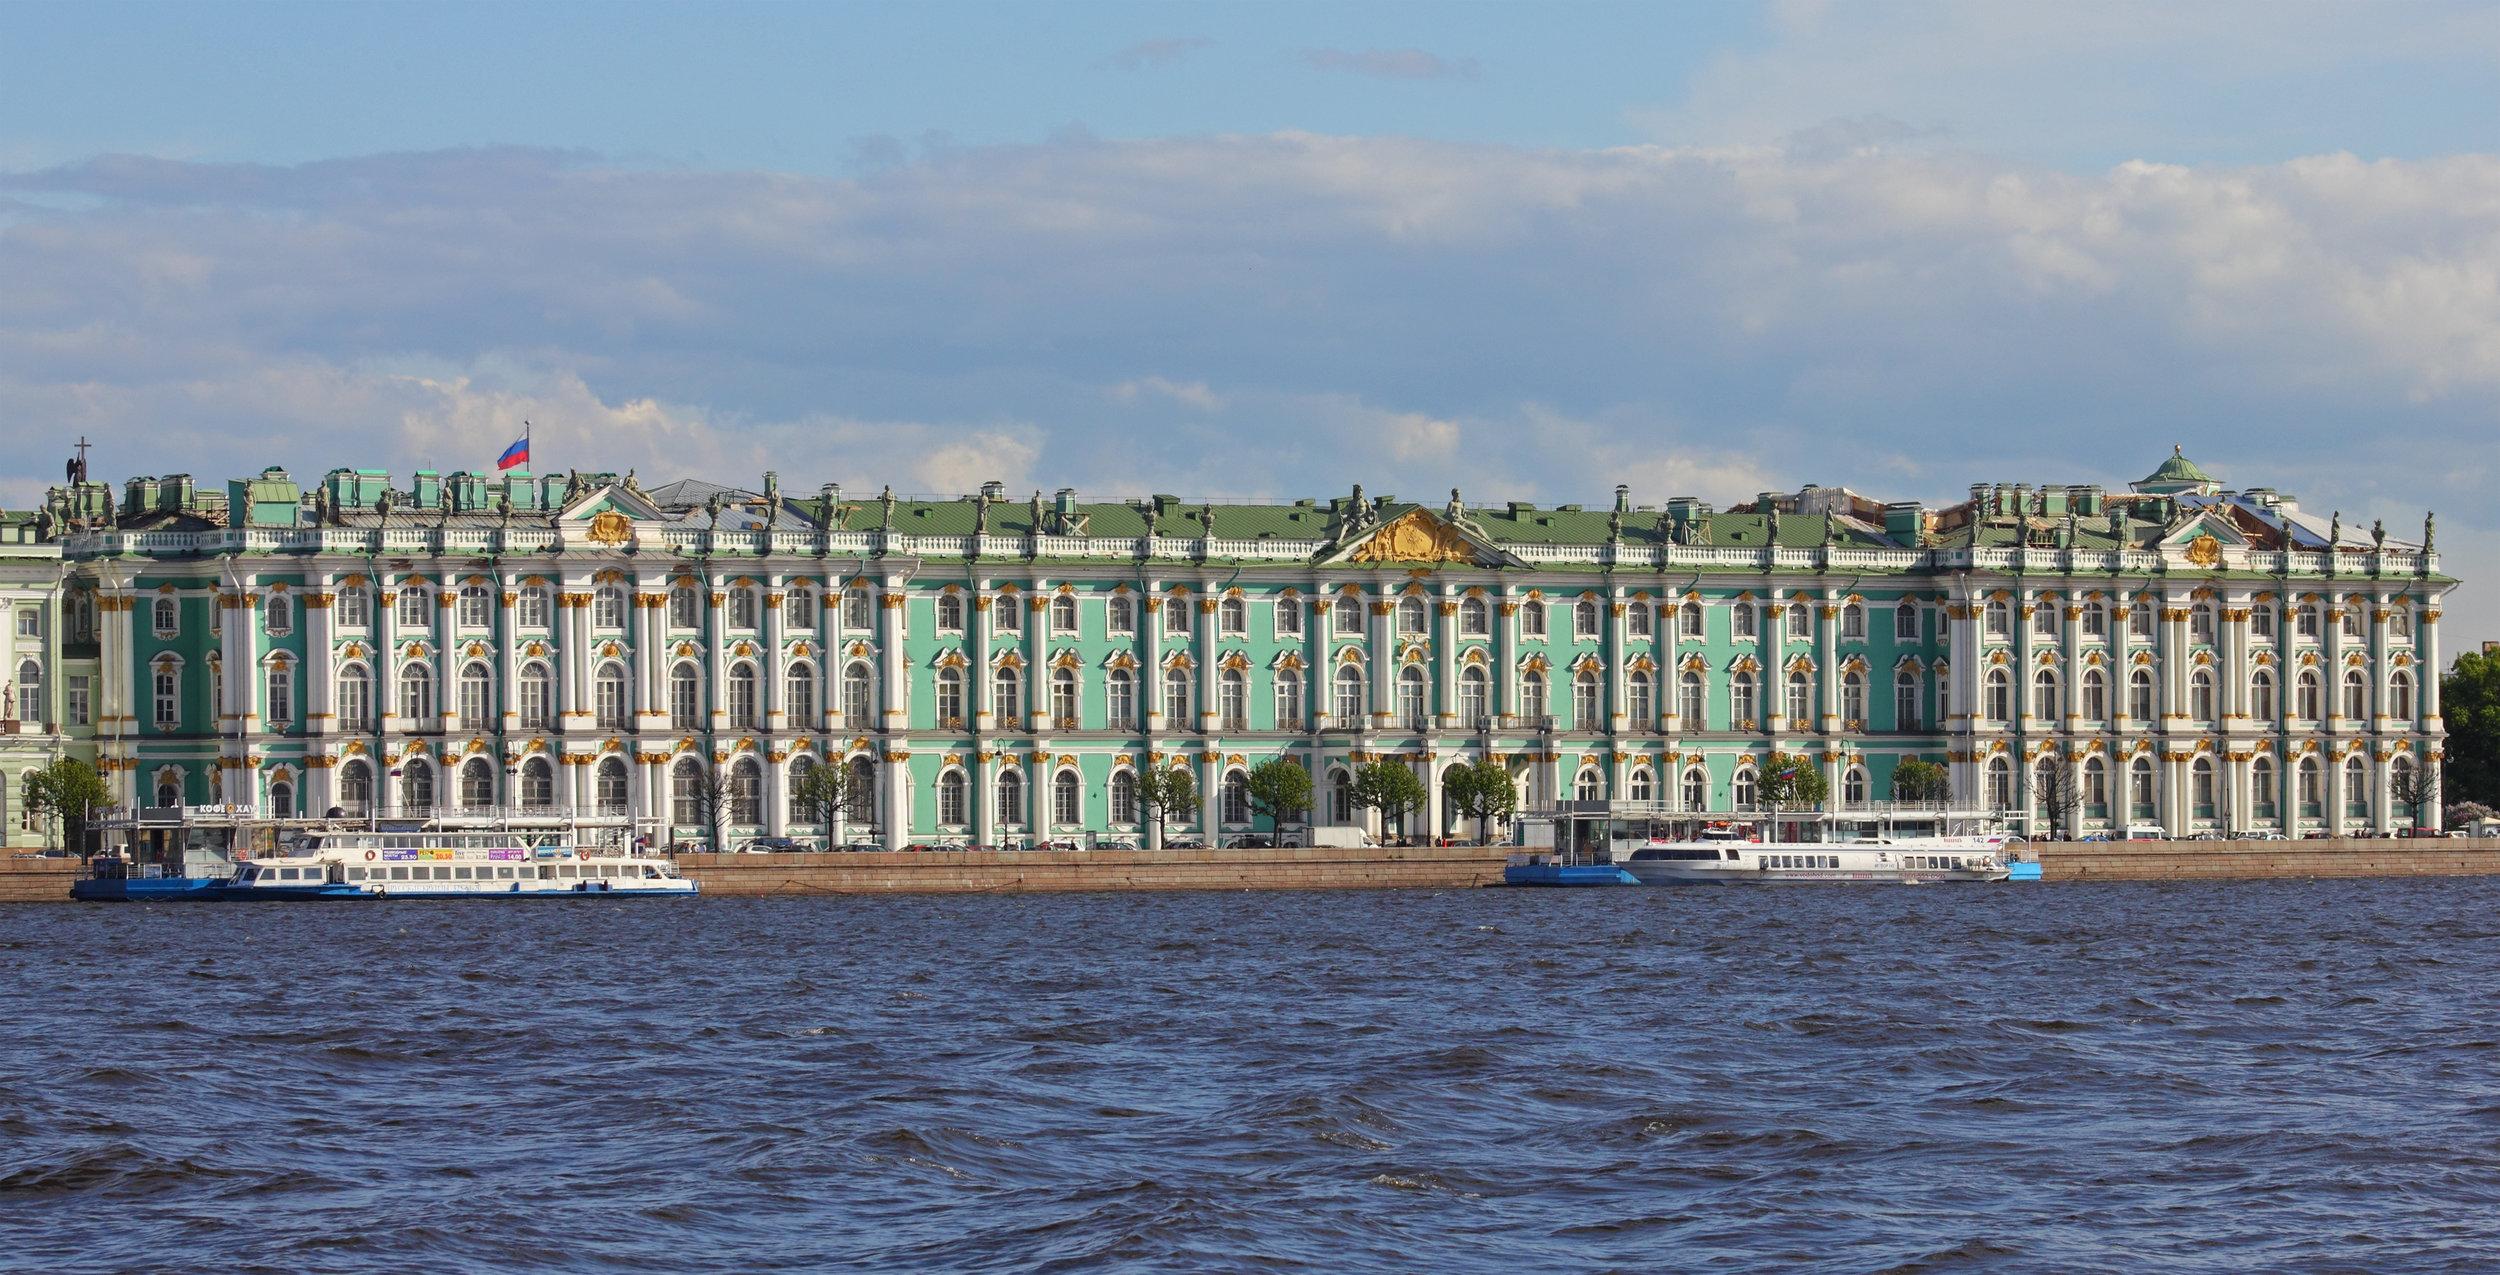 Spb_06-2012_Palace_Embankment_various_14.jpg